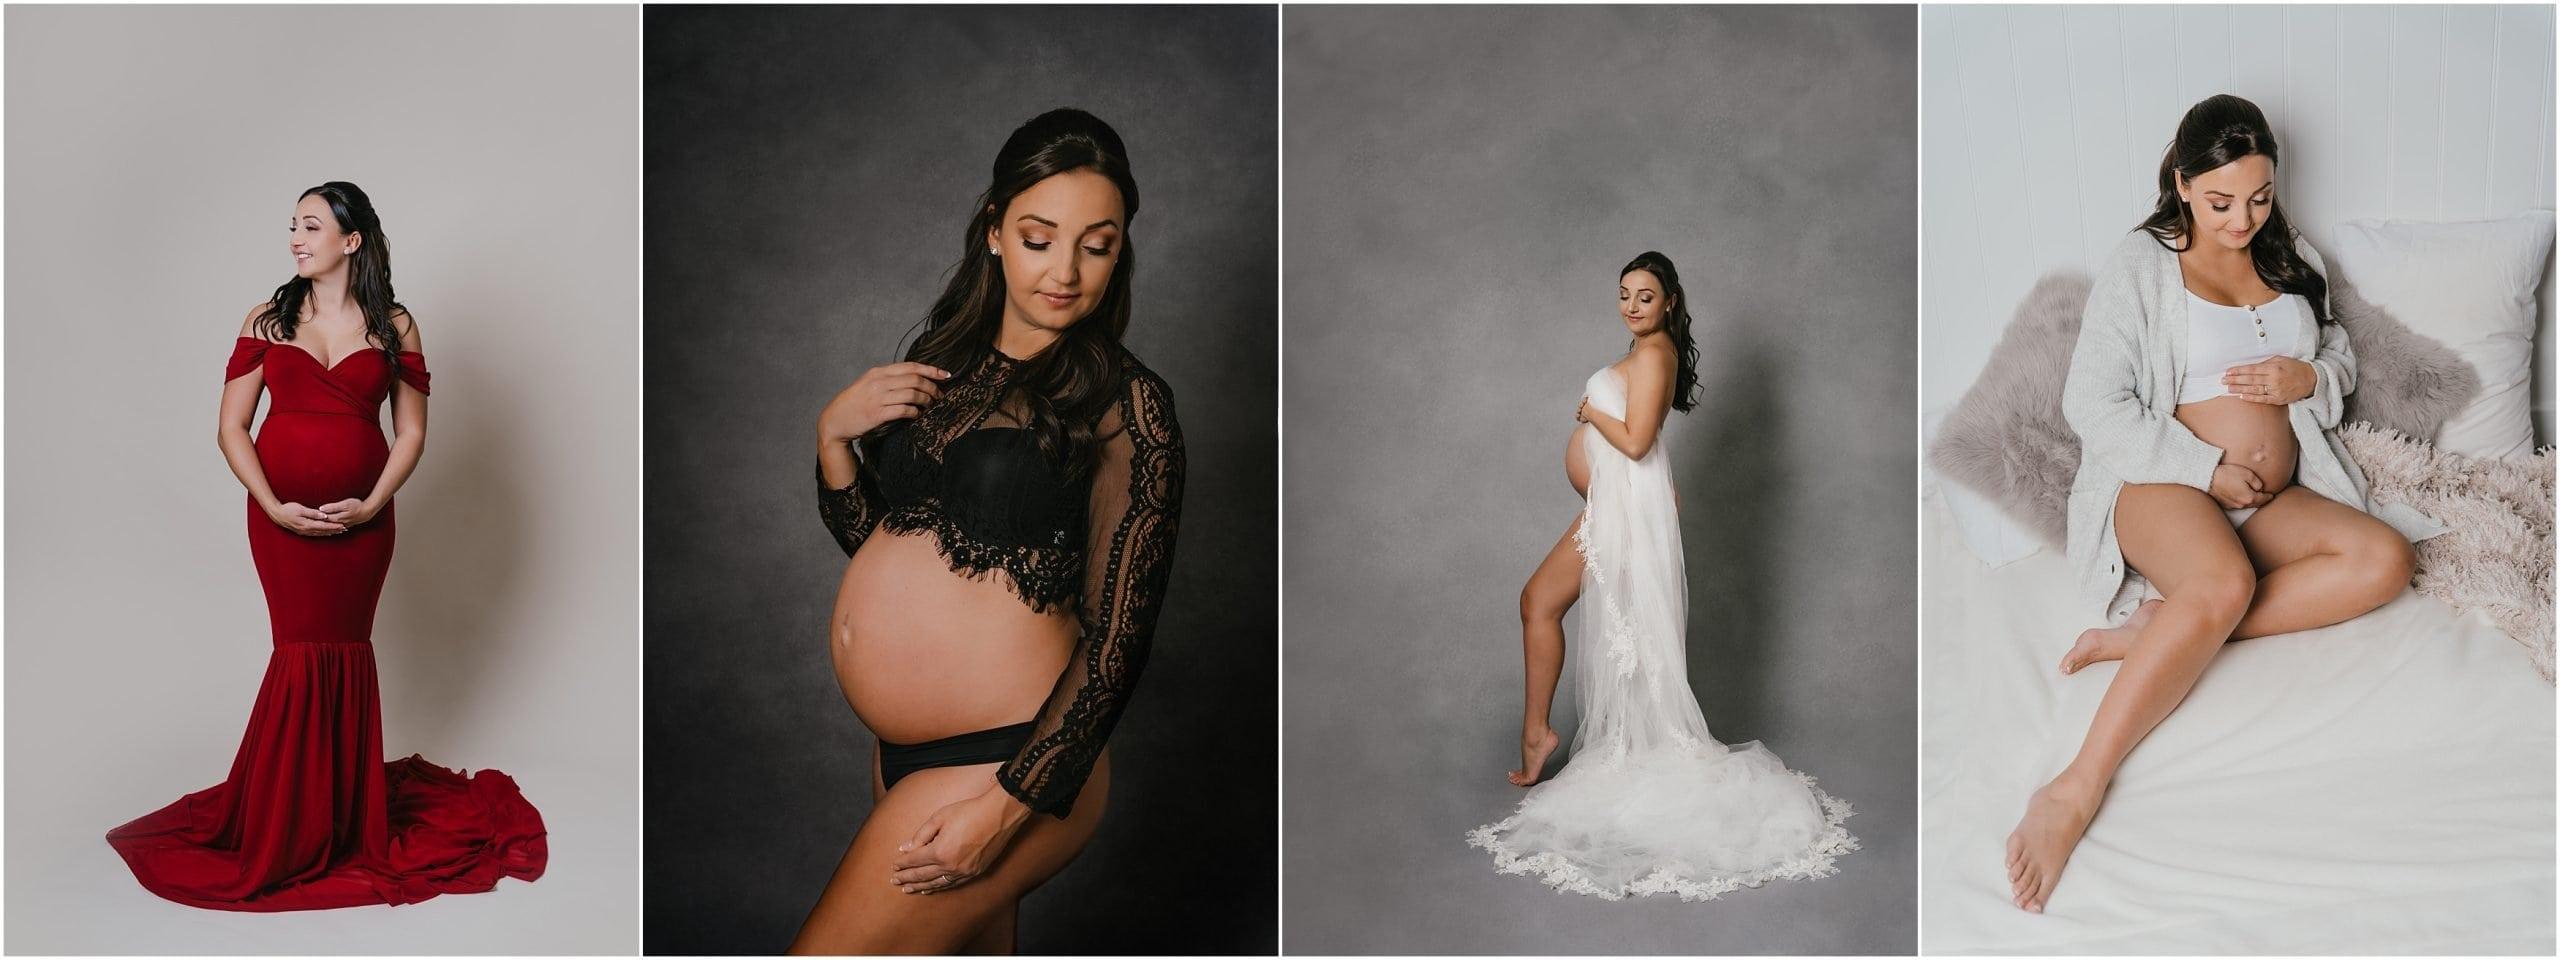 Pregnant lady in photo studio